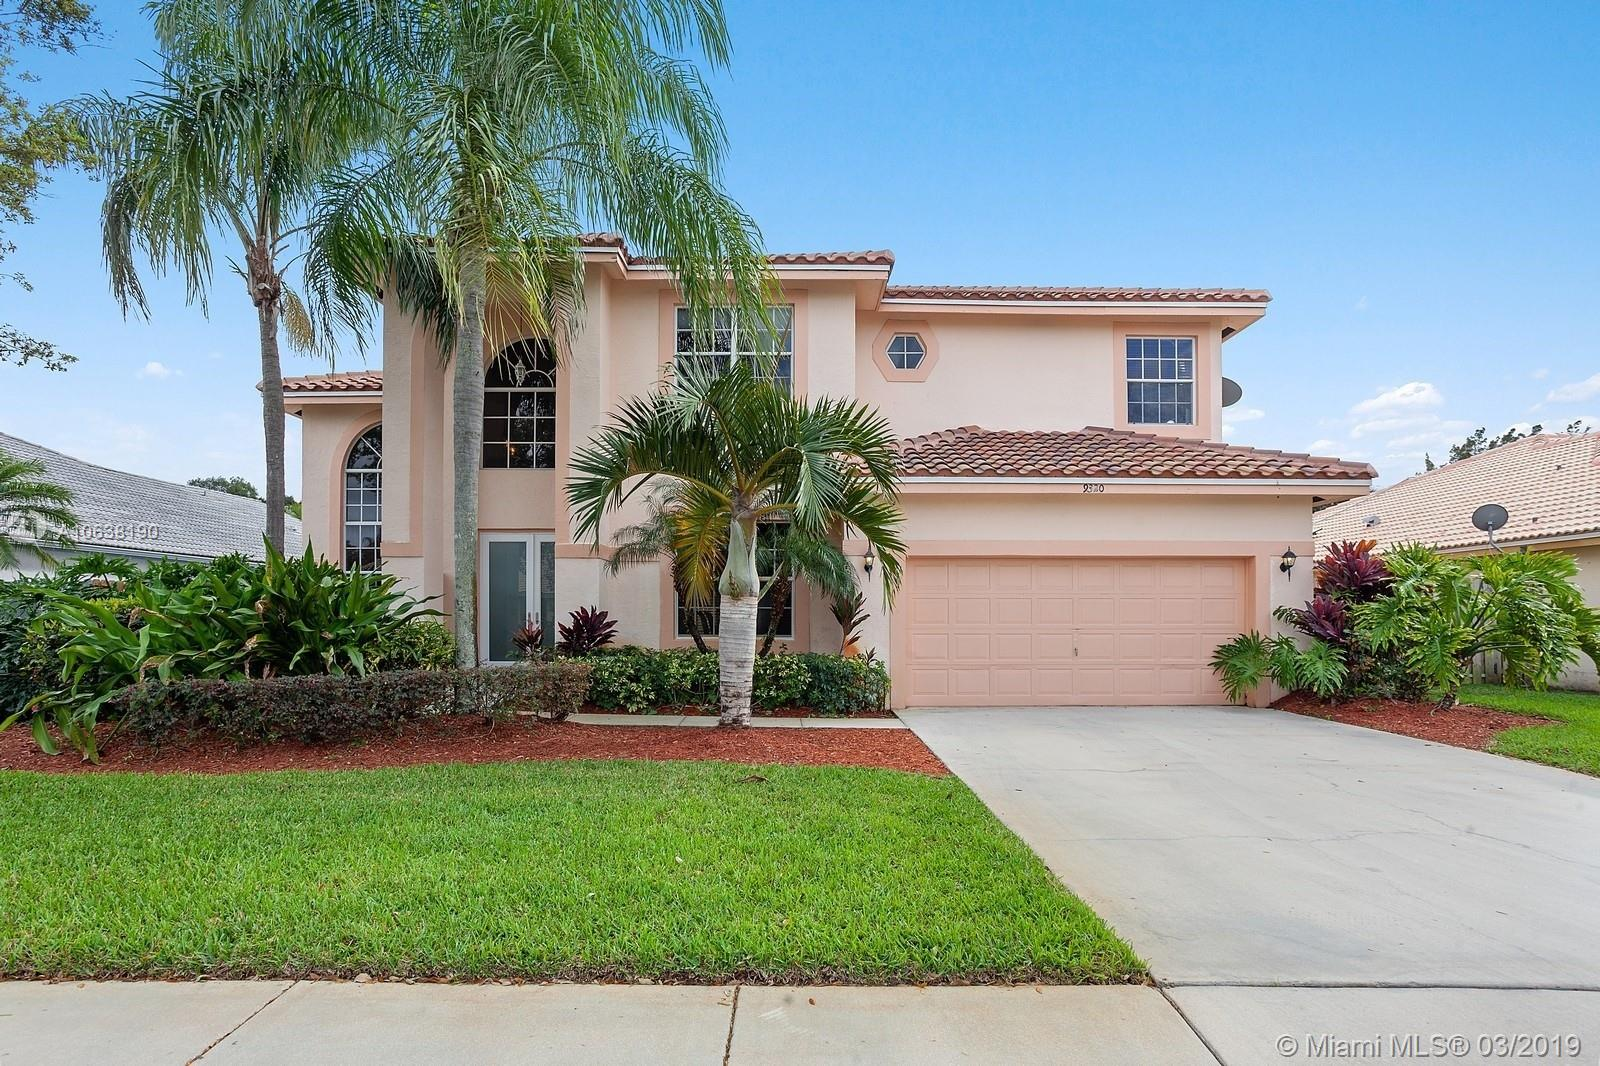 539 Carrington Dr, Weston, Florida